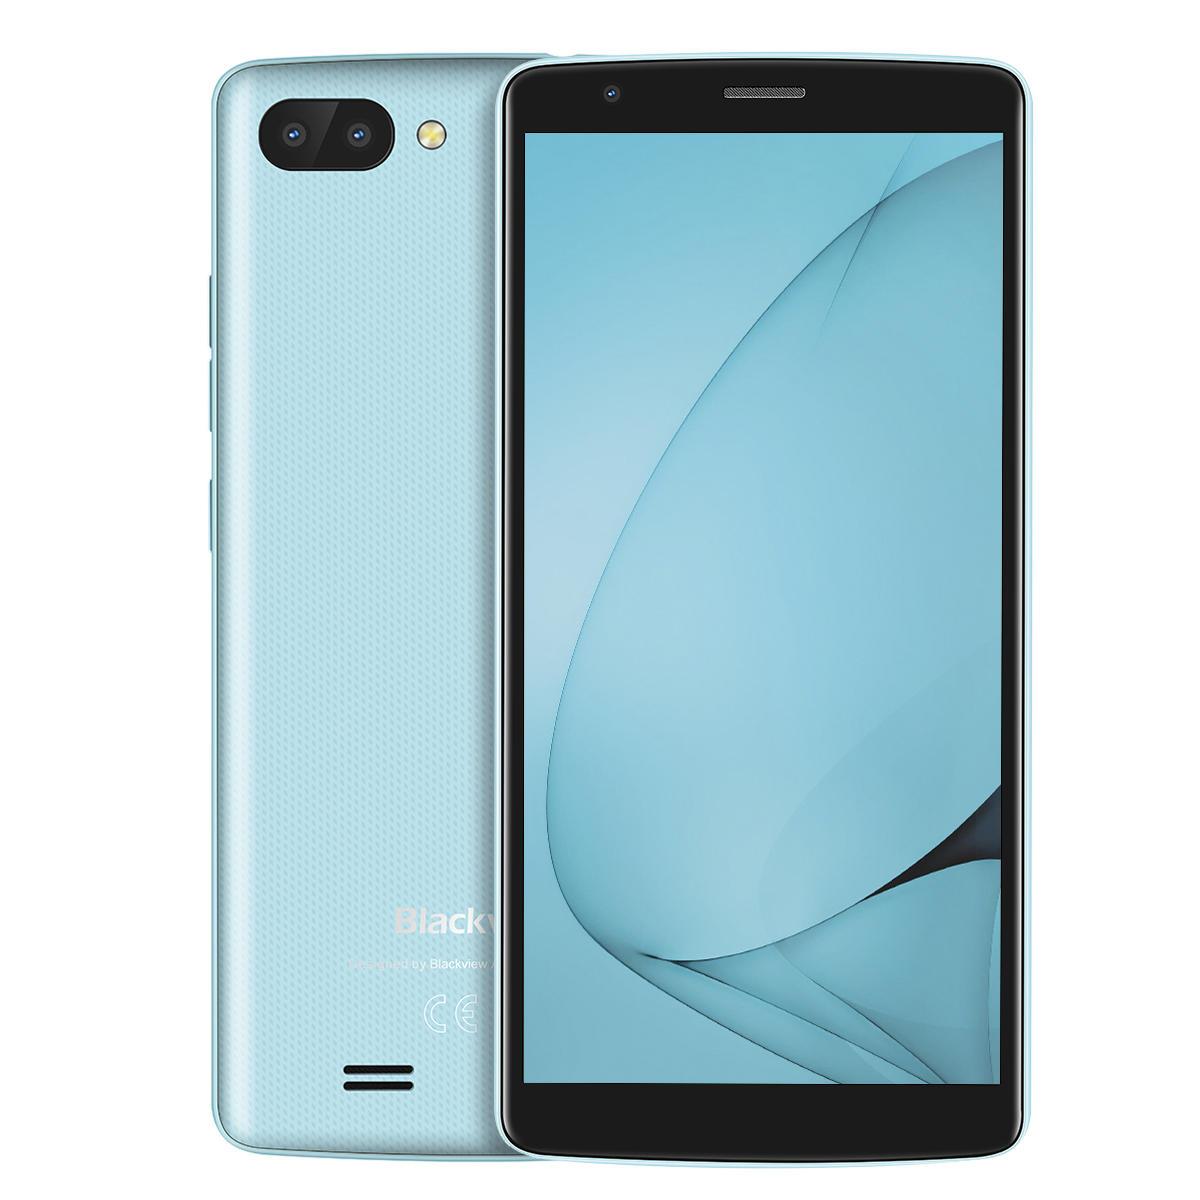 banggood Blackview A20 3G MTK6580 1.3GHz 4コア BLUE(ブルー)